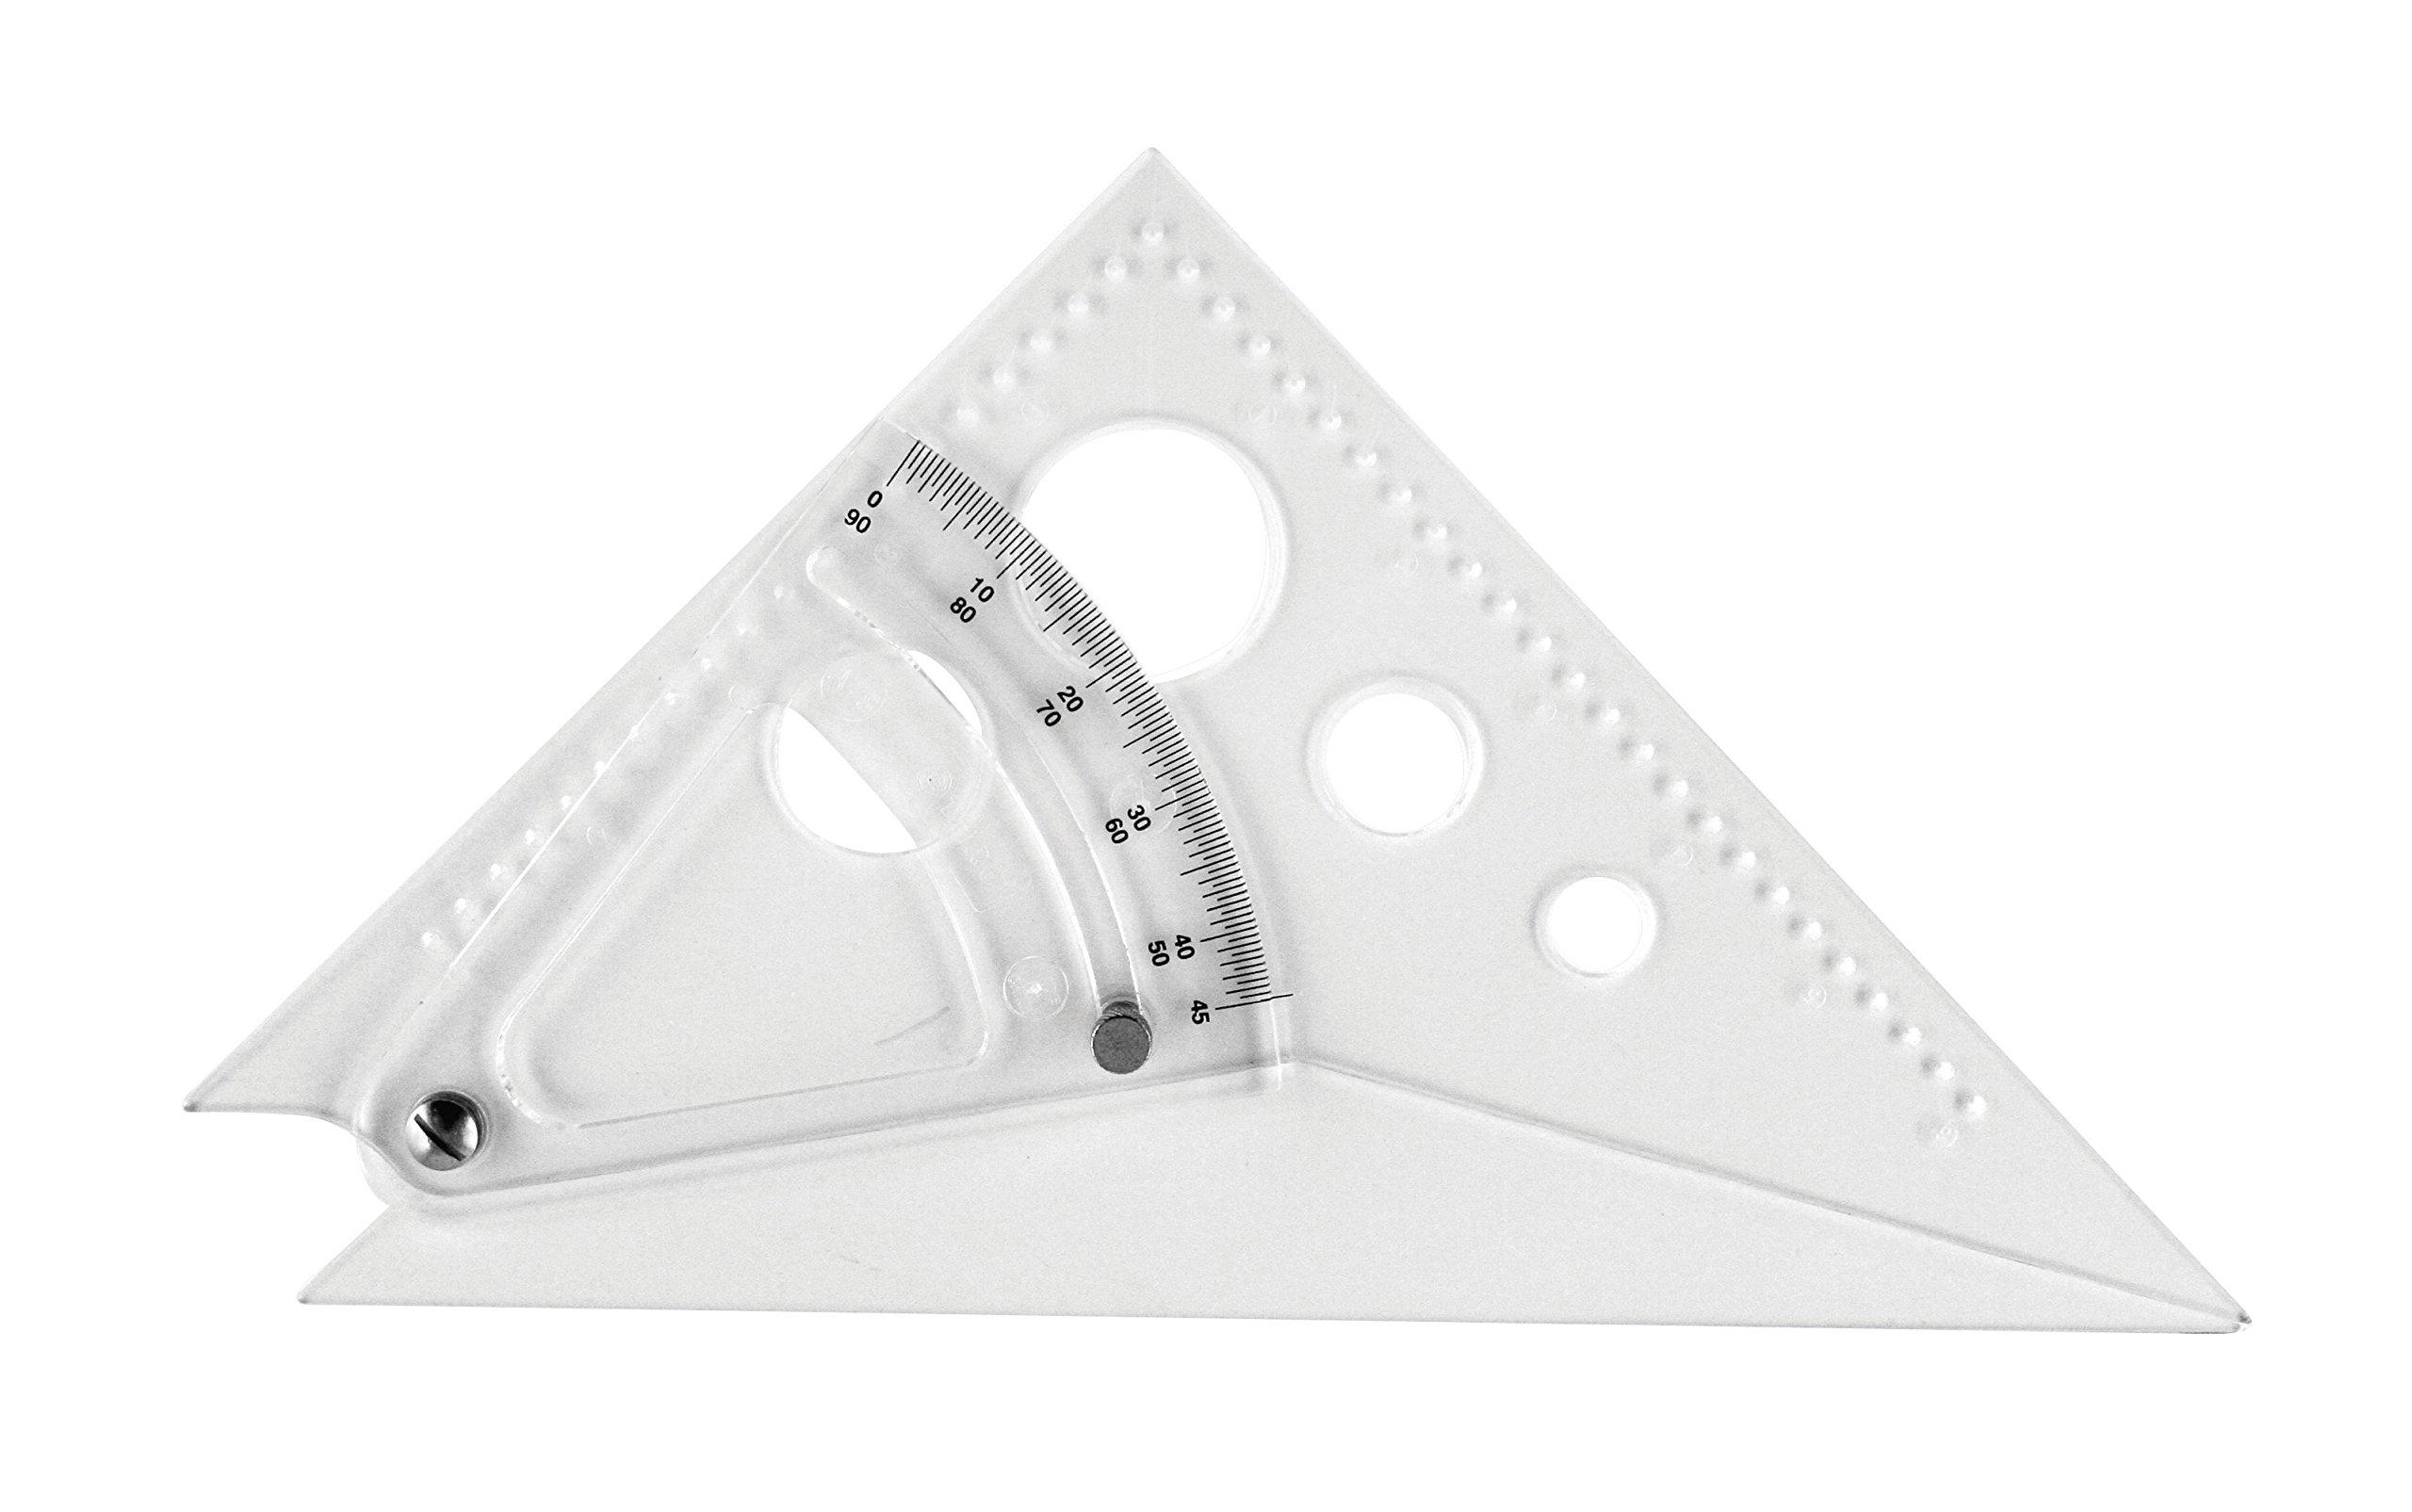 Westcott 8'' Adjustable Triangle Scale, at-8 by Westcott